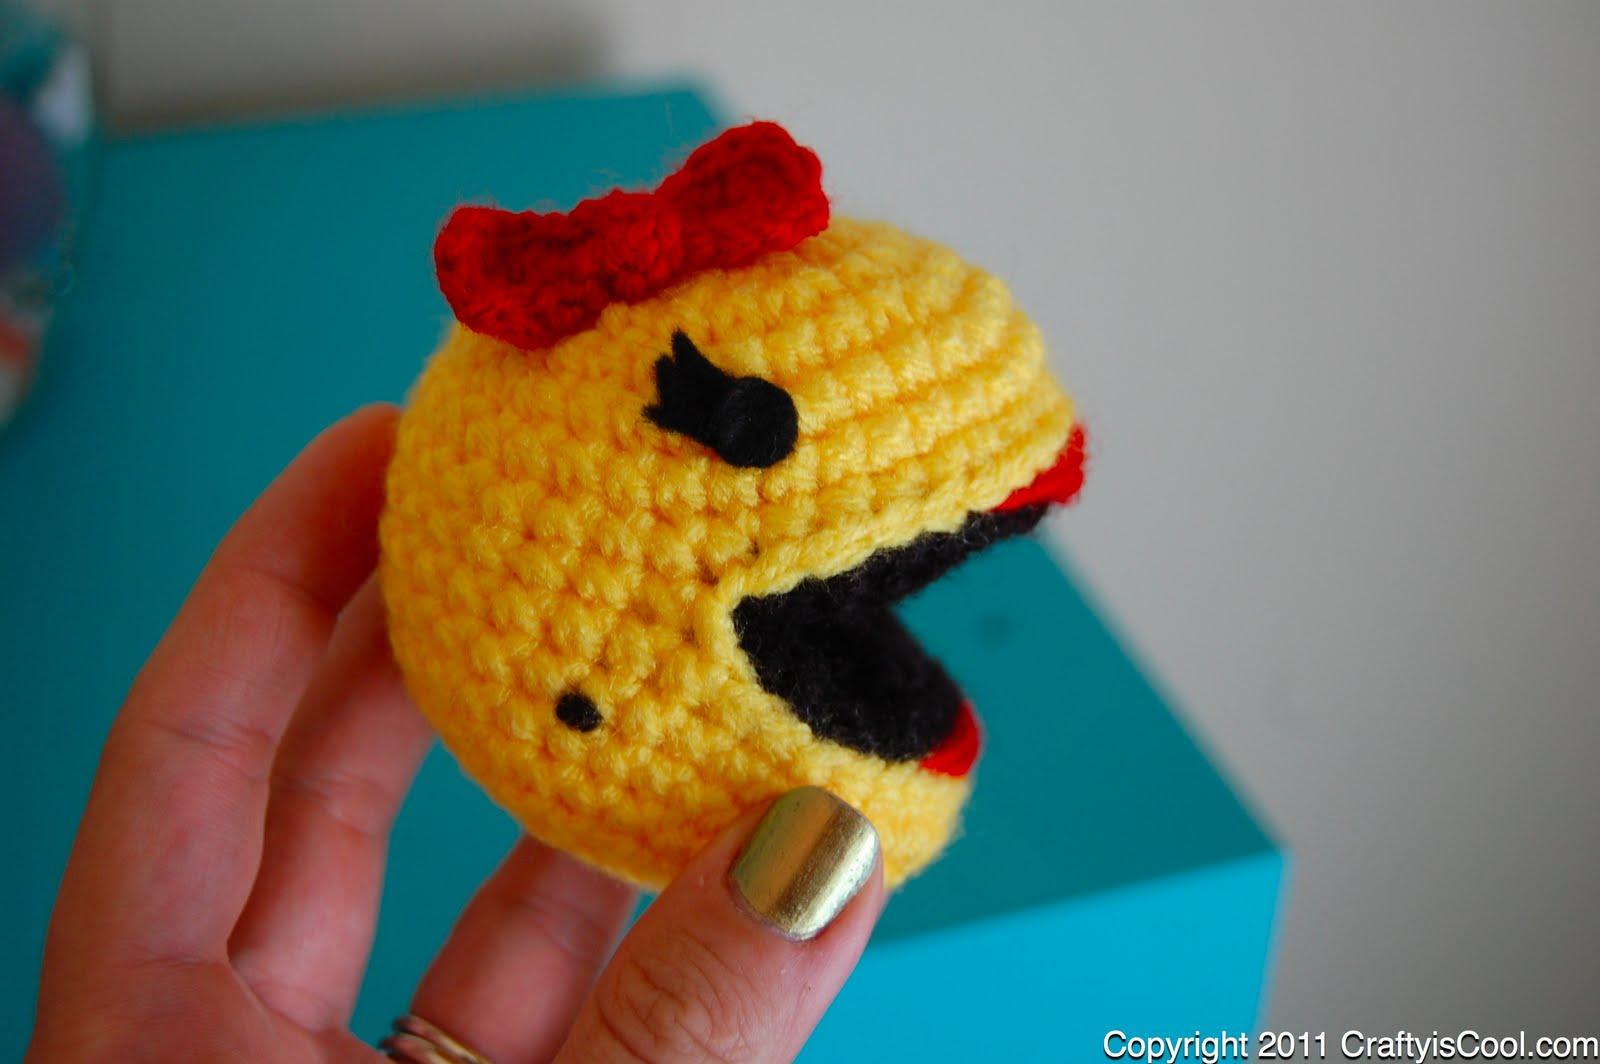 Amigurumi Pacman : CRAFTYisCOOL: Free Pattern Friday! Ms. Pac-man